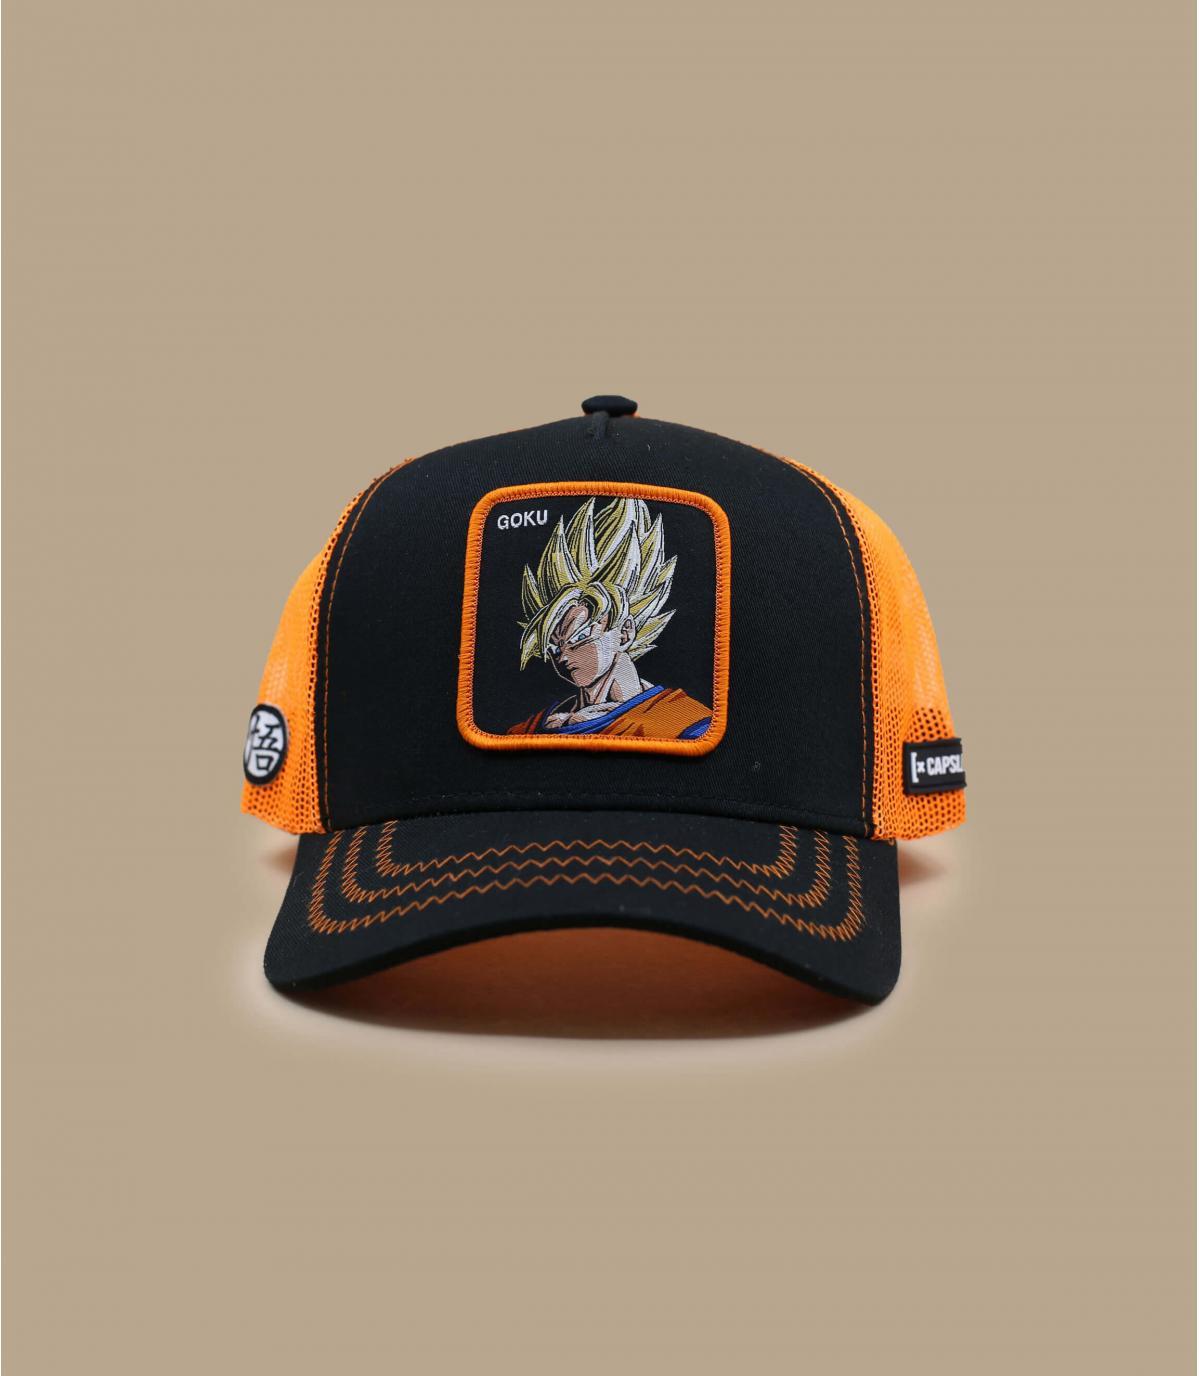 black Son Goku trucker